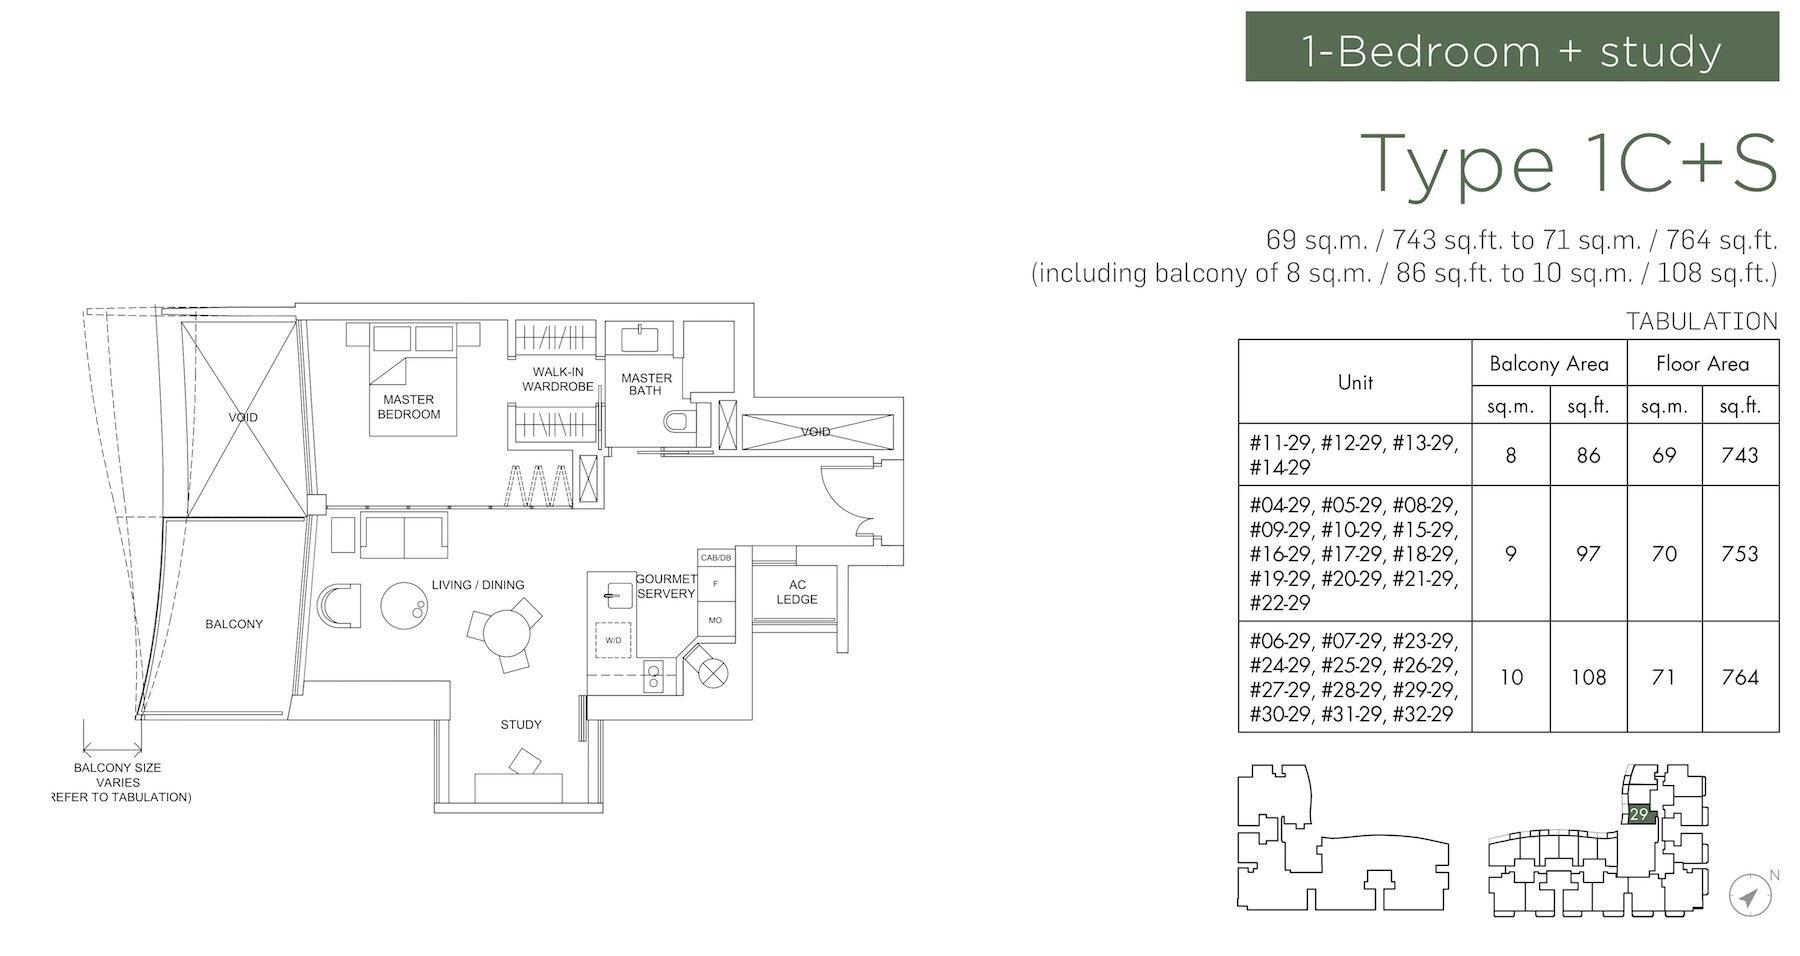 Marina One Residences 滨海盛景豪苑 floor plans 1 bedroom +study 1C+S